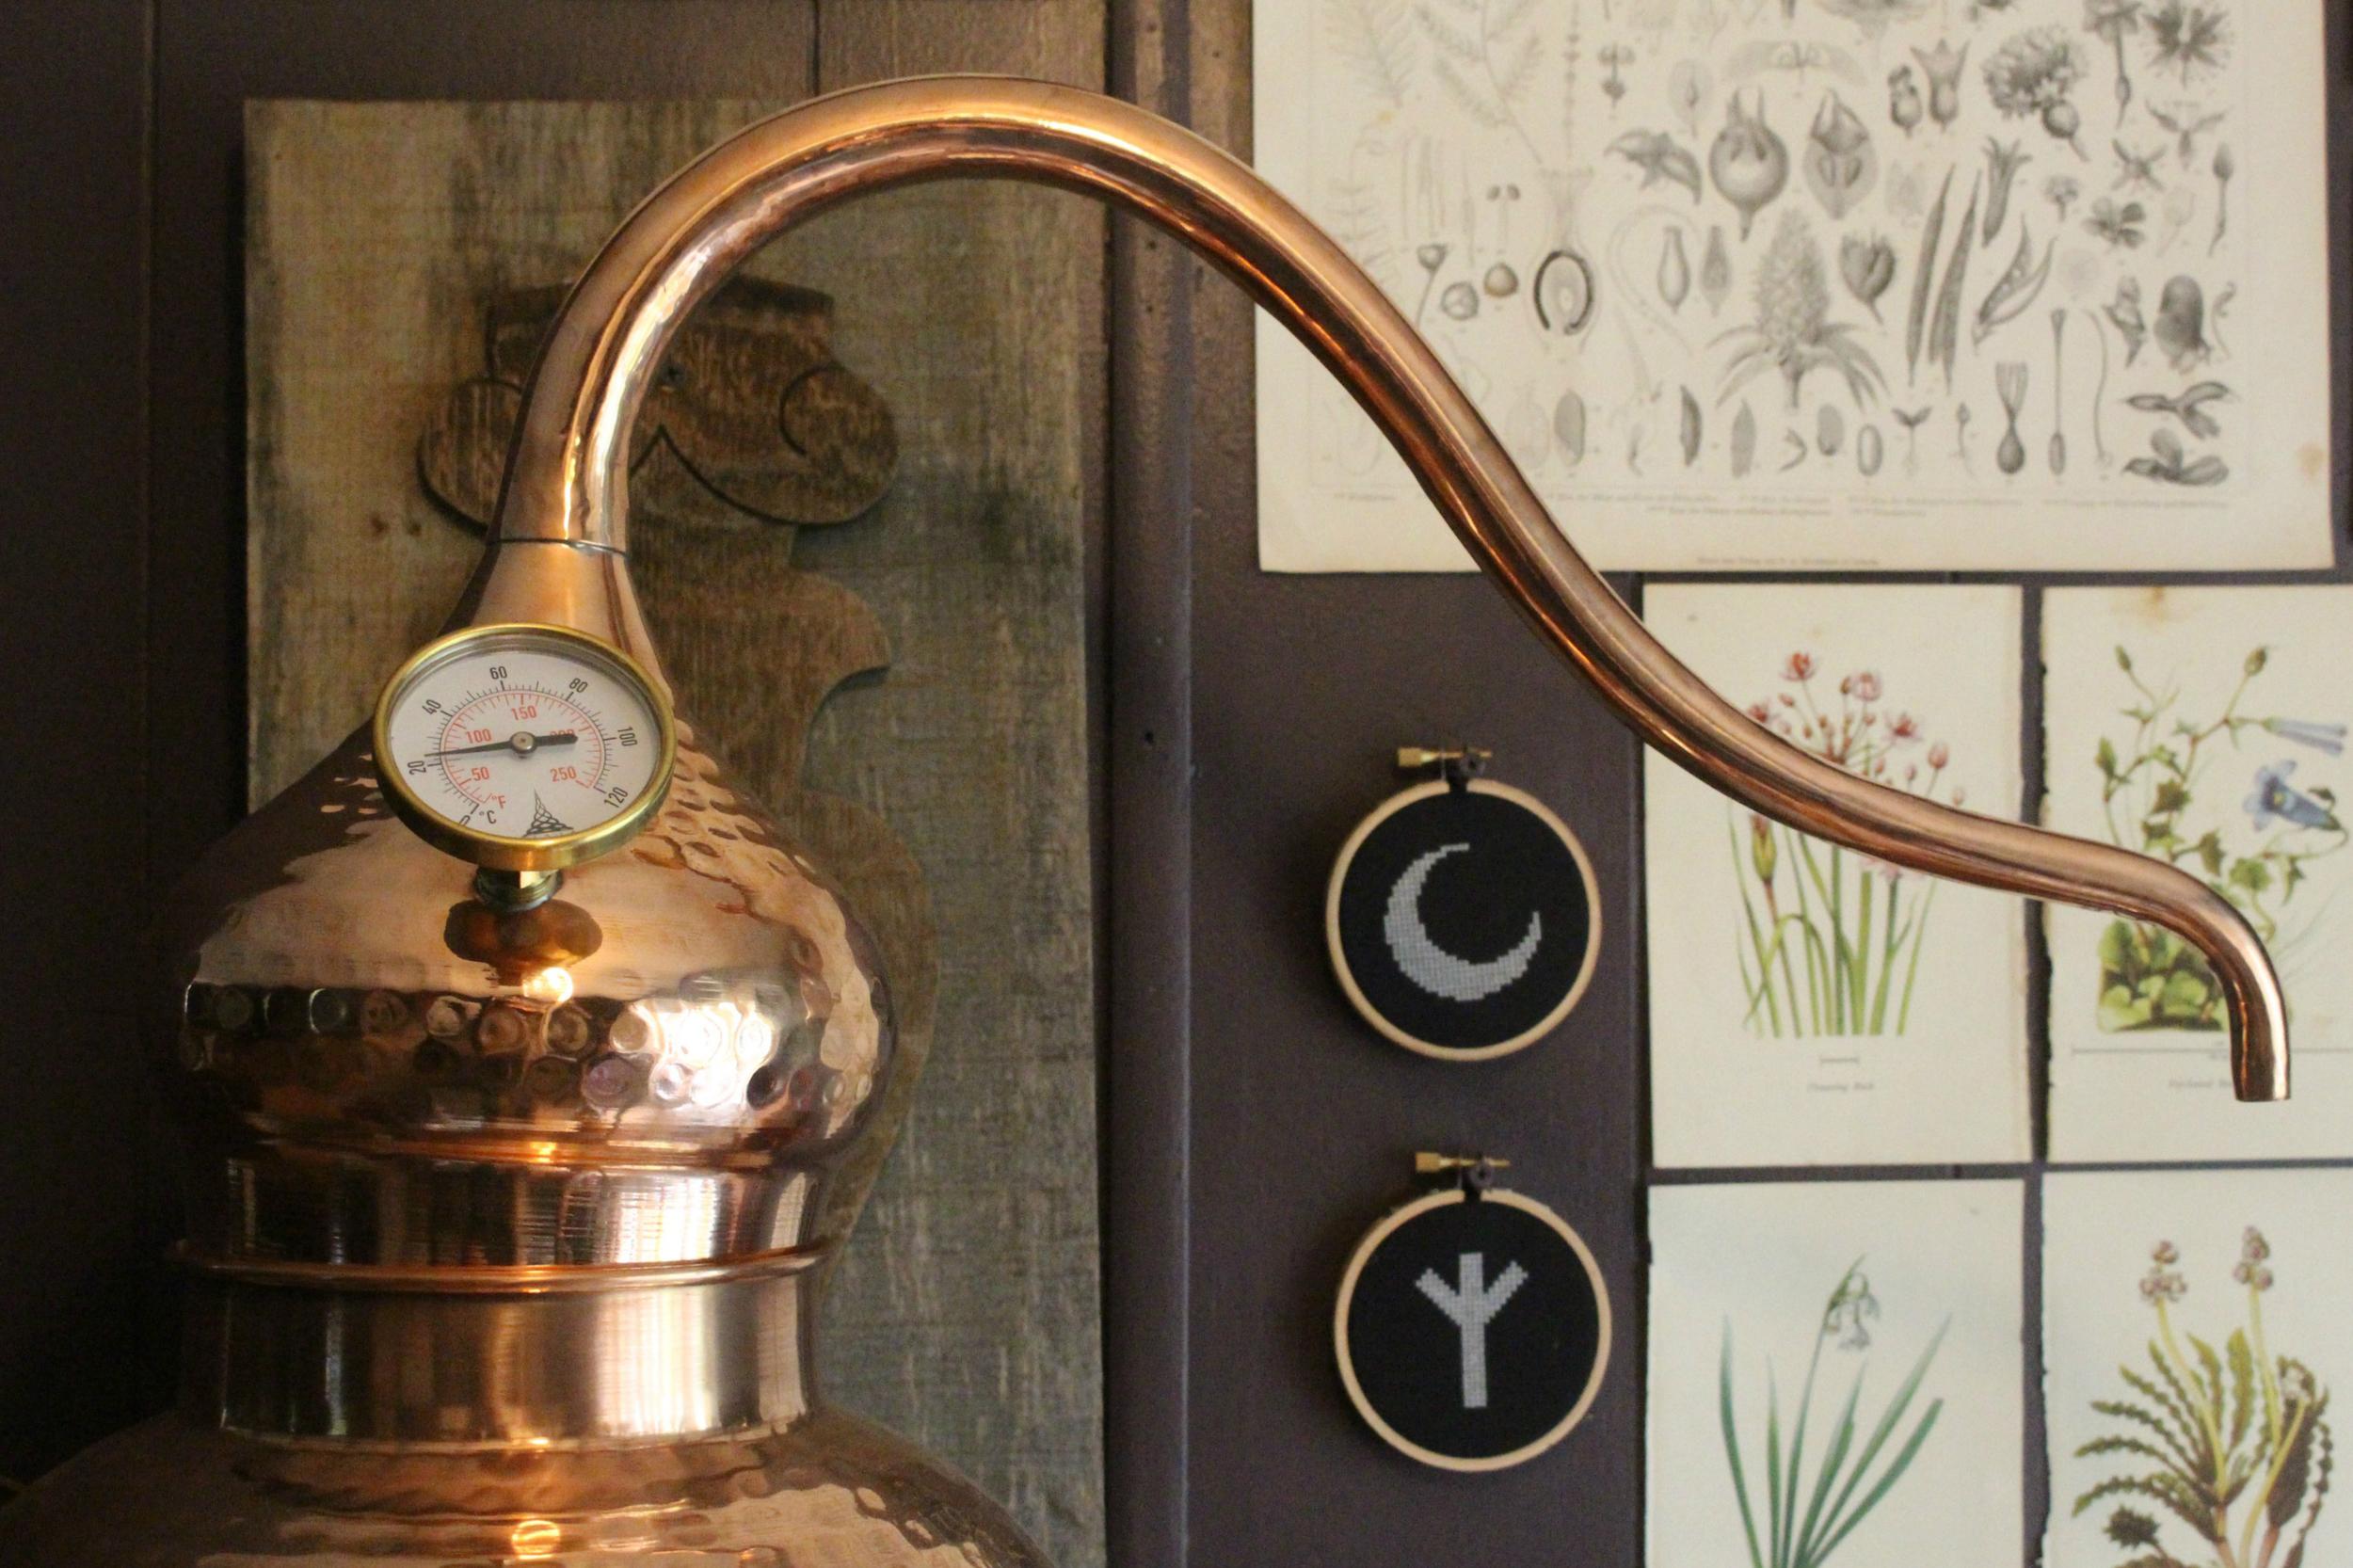 A copper distiller in Ash Sierra's home